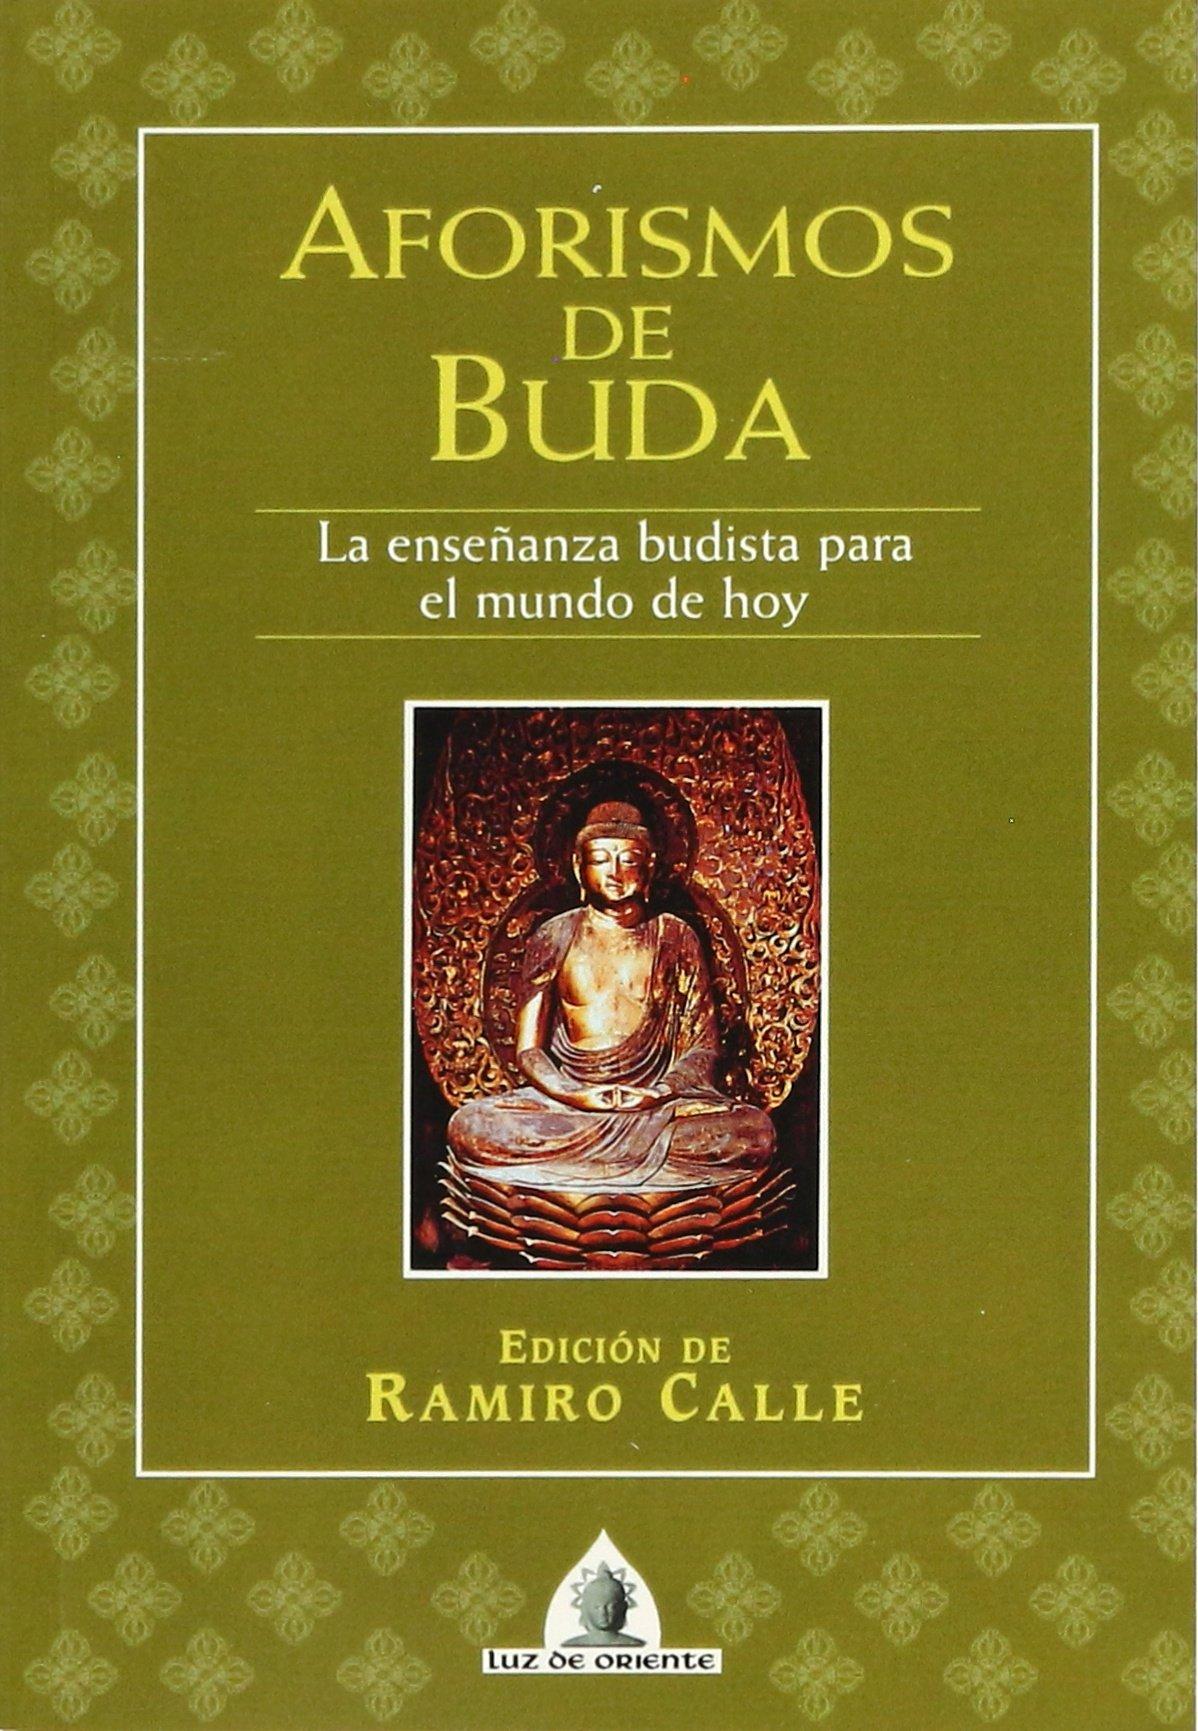 Read Online Aforismos de buda pdf